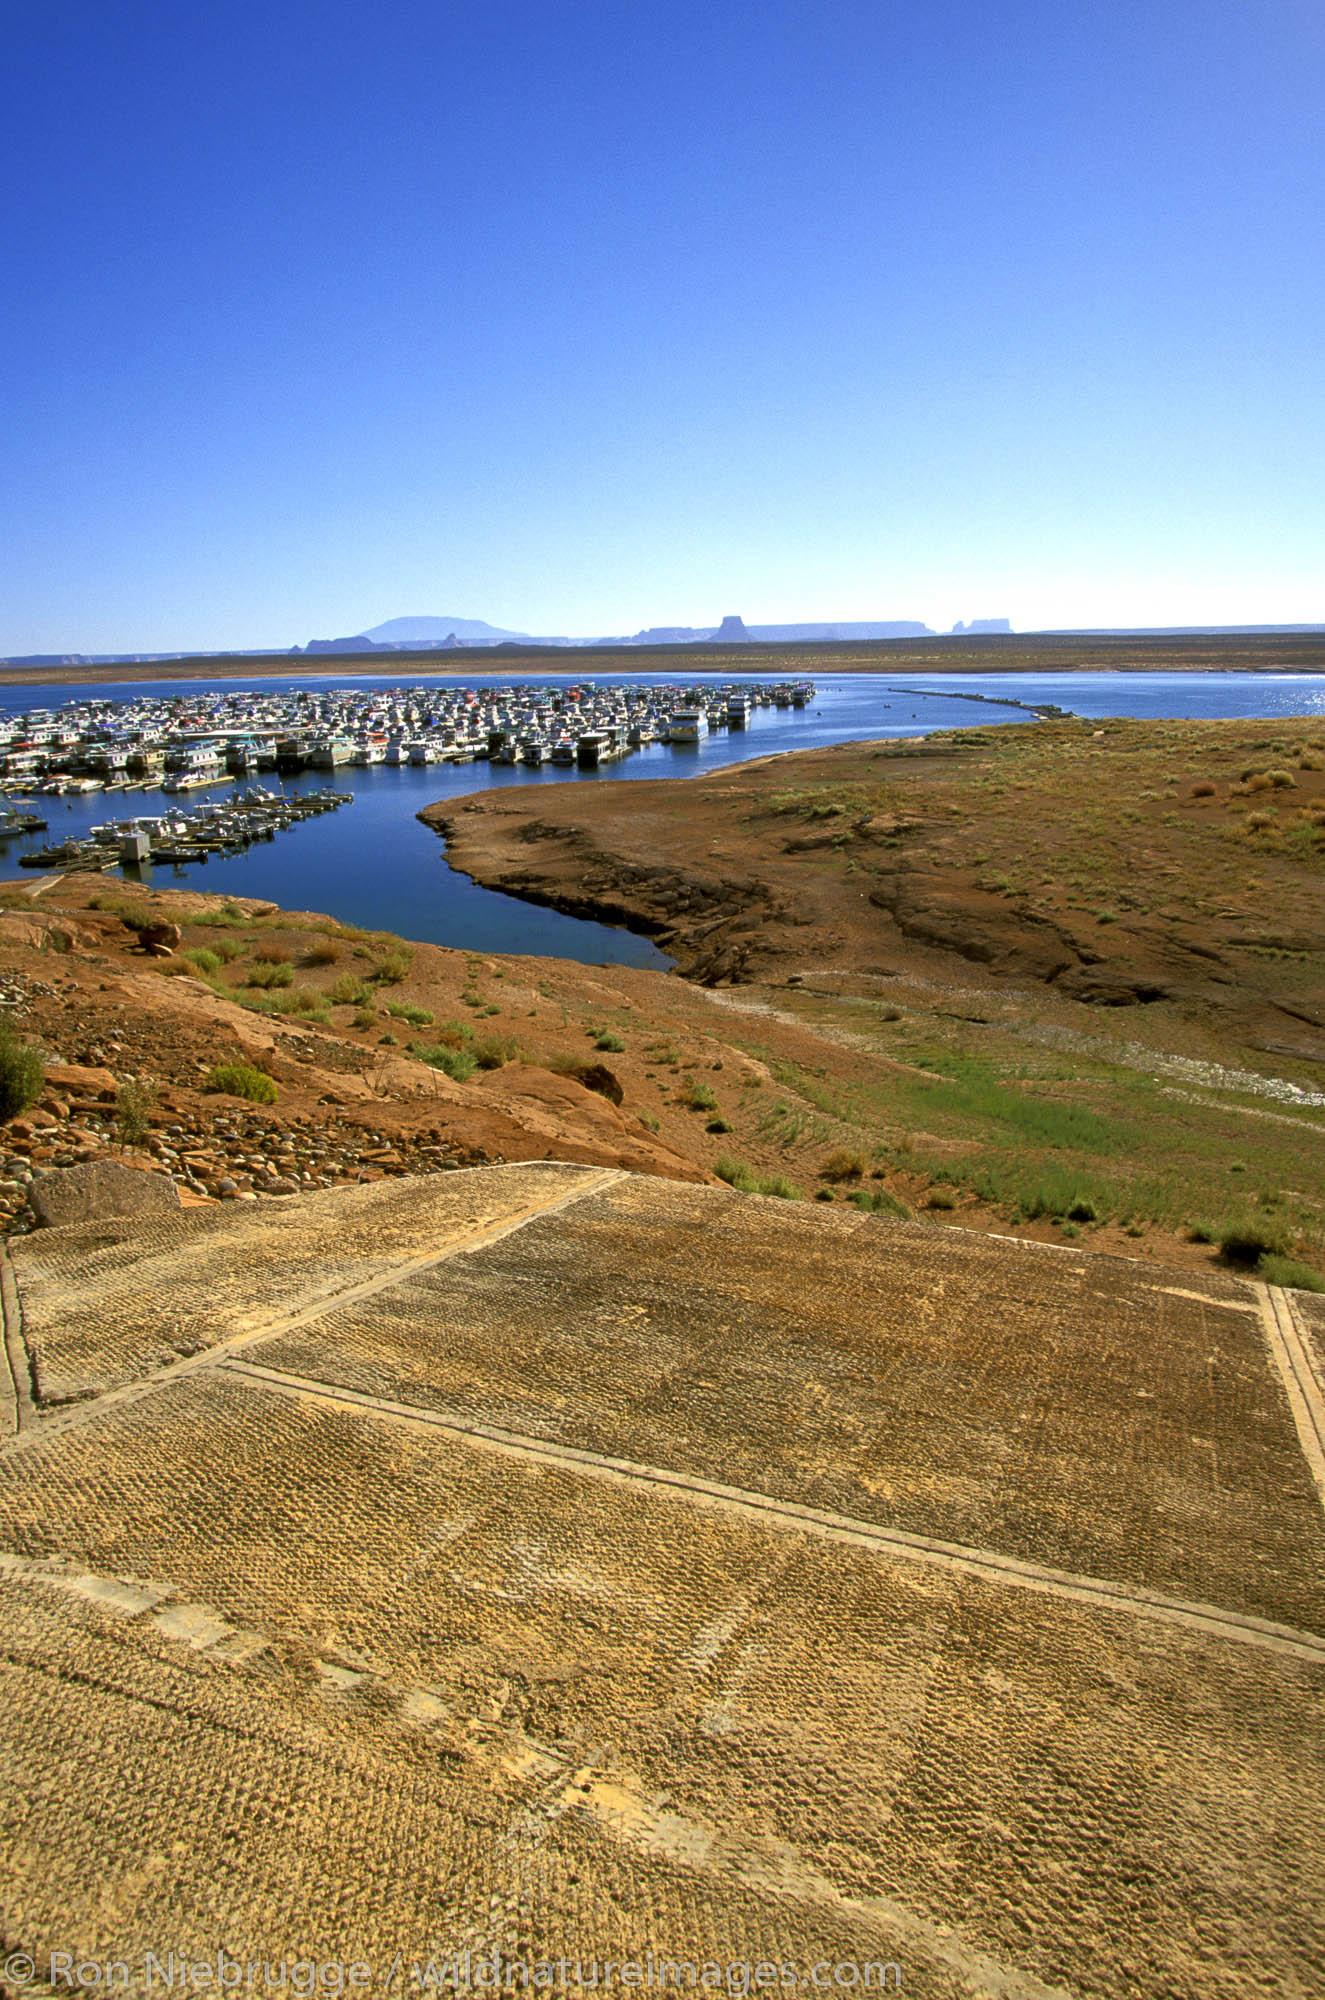 Boat Launch.  Lake Powell, Glen Canyon National Recreation Area.  Arizona, Utah.